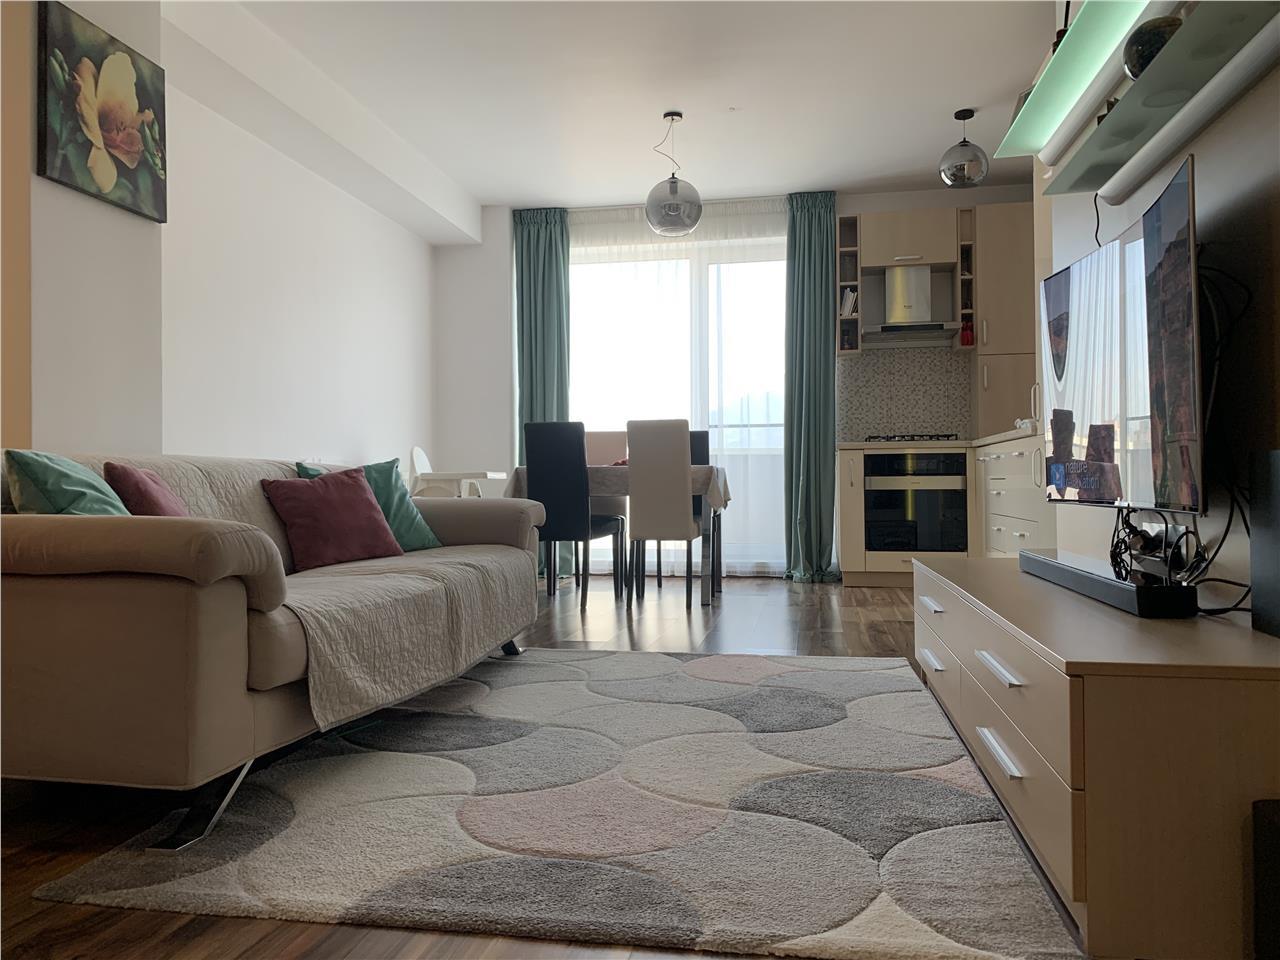 Apartament de familie in zona carpatilor